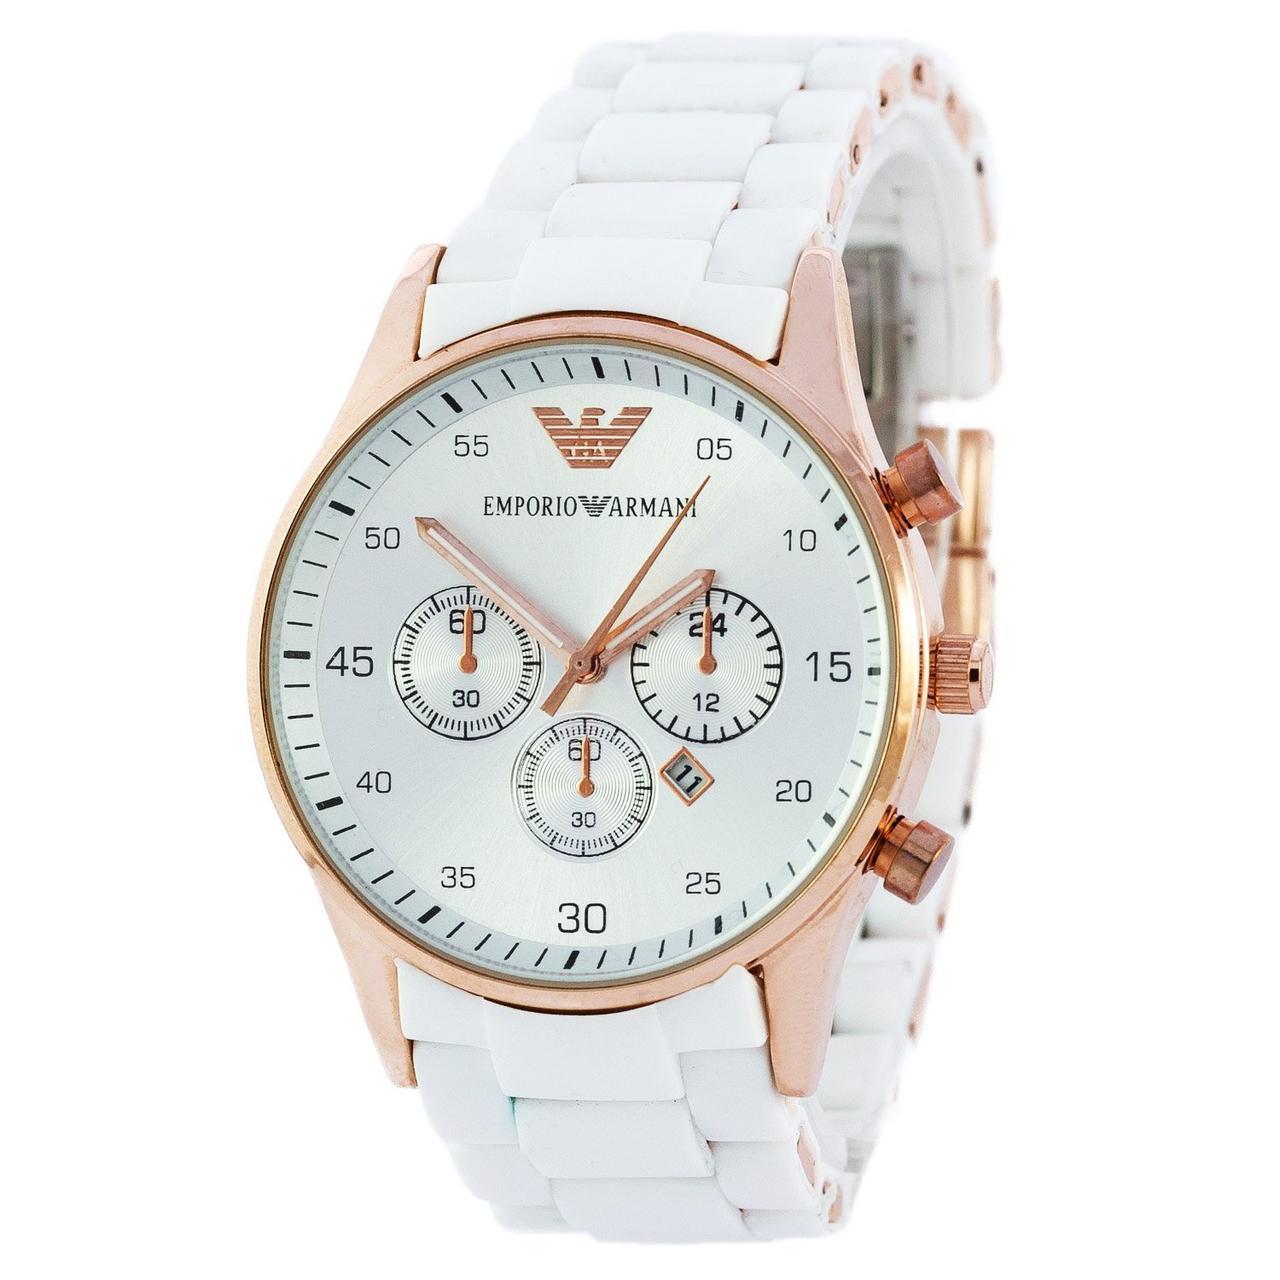 6e1870c9 Мужские наручные часы (копия) Emporio Armani Silicone Gold-White, цена  374,85 грн., купить в Харькове — Prom.ua (ID#788656384)